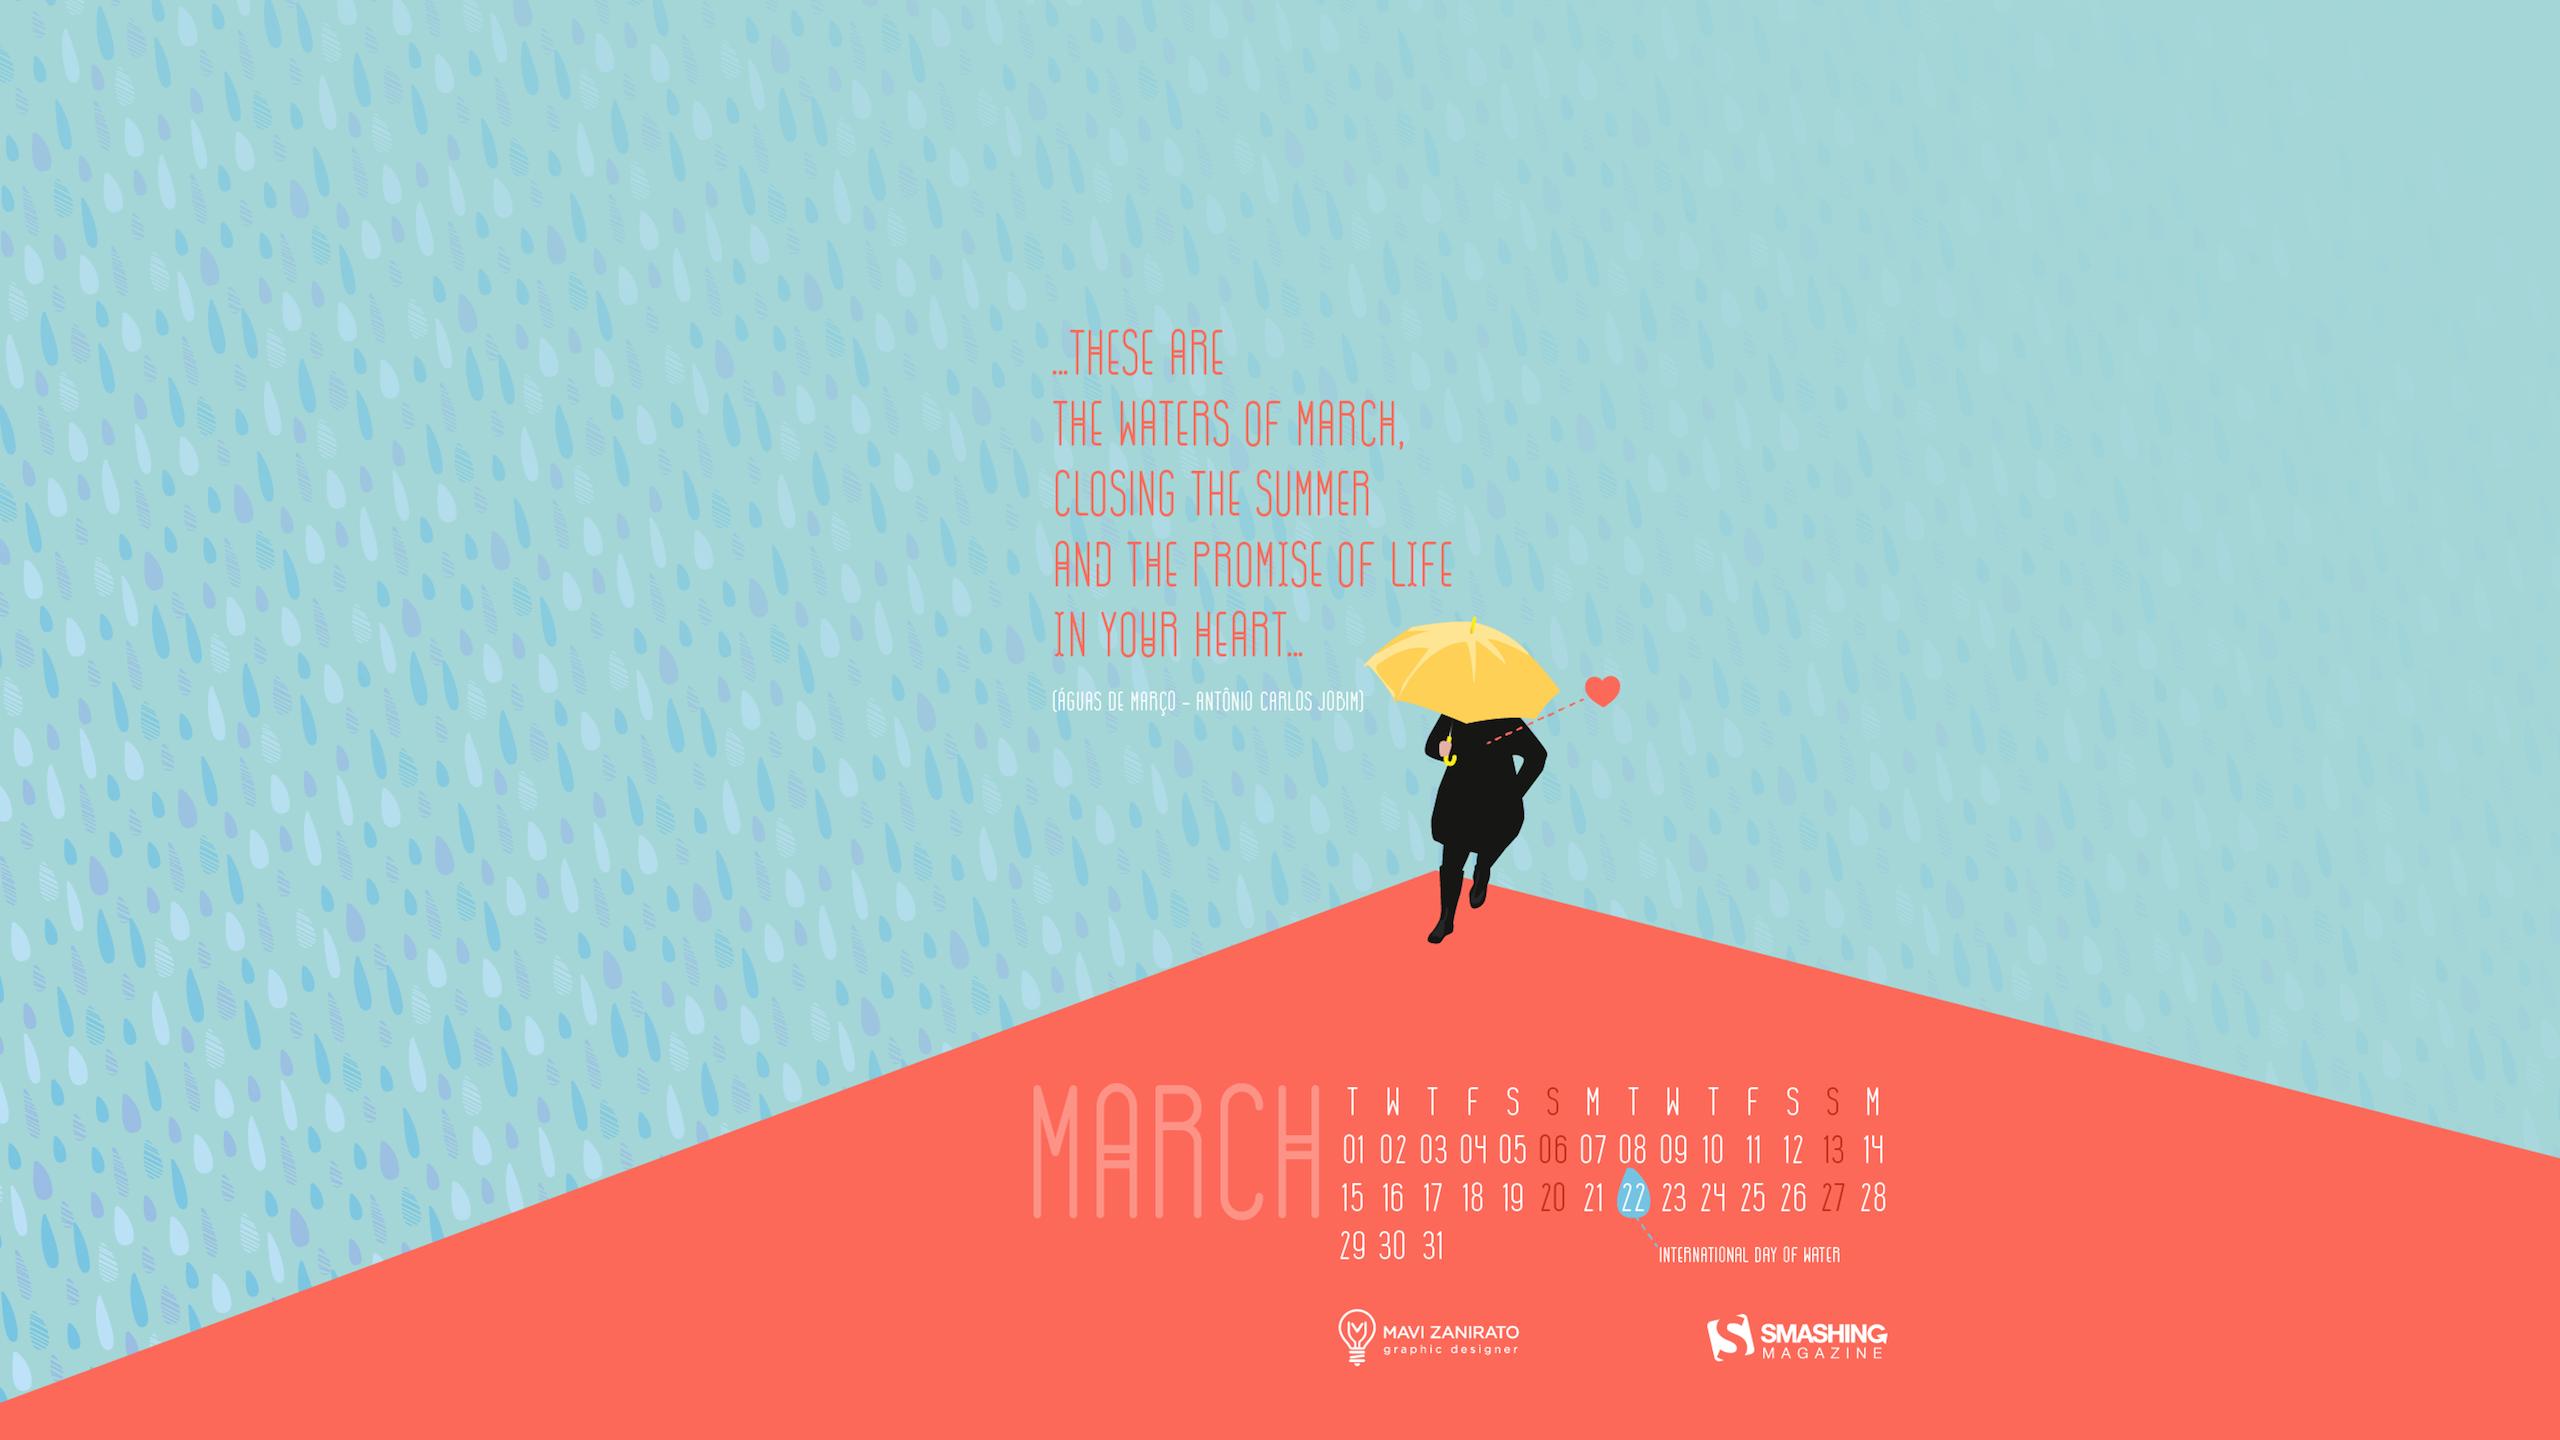 Desktop Wallpaper Calendars March 2016 Smashing Magazine 2560x1440